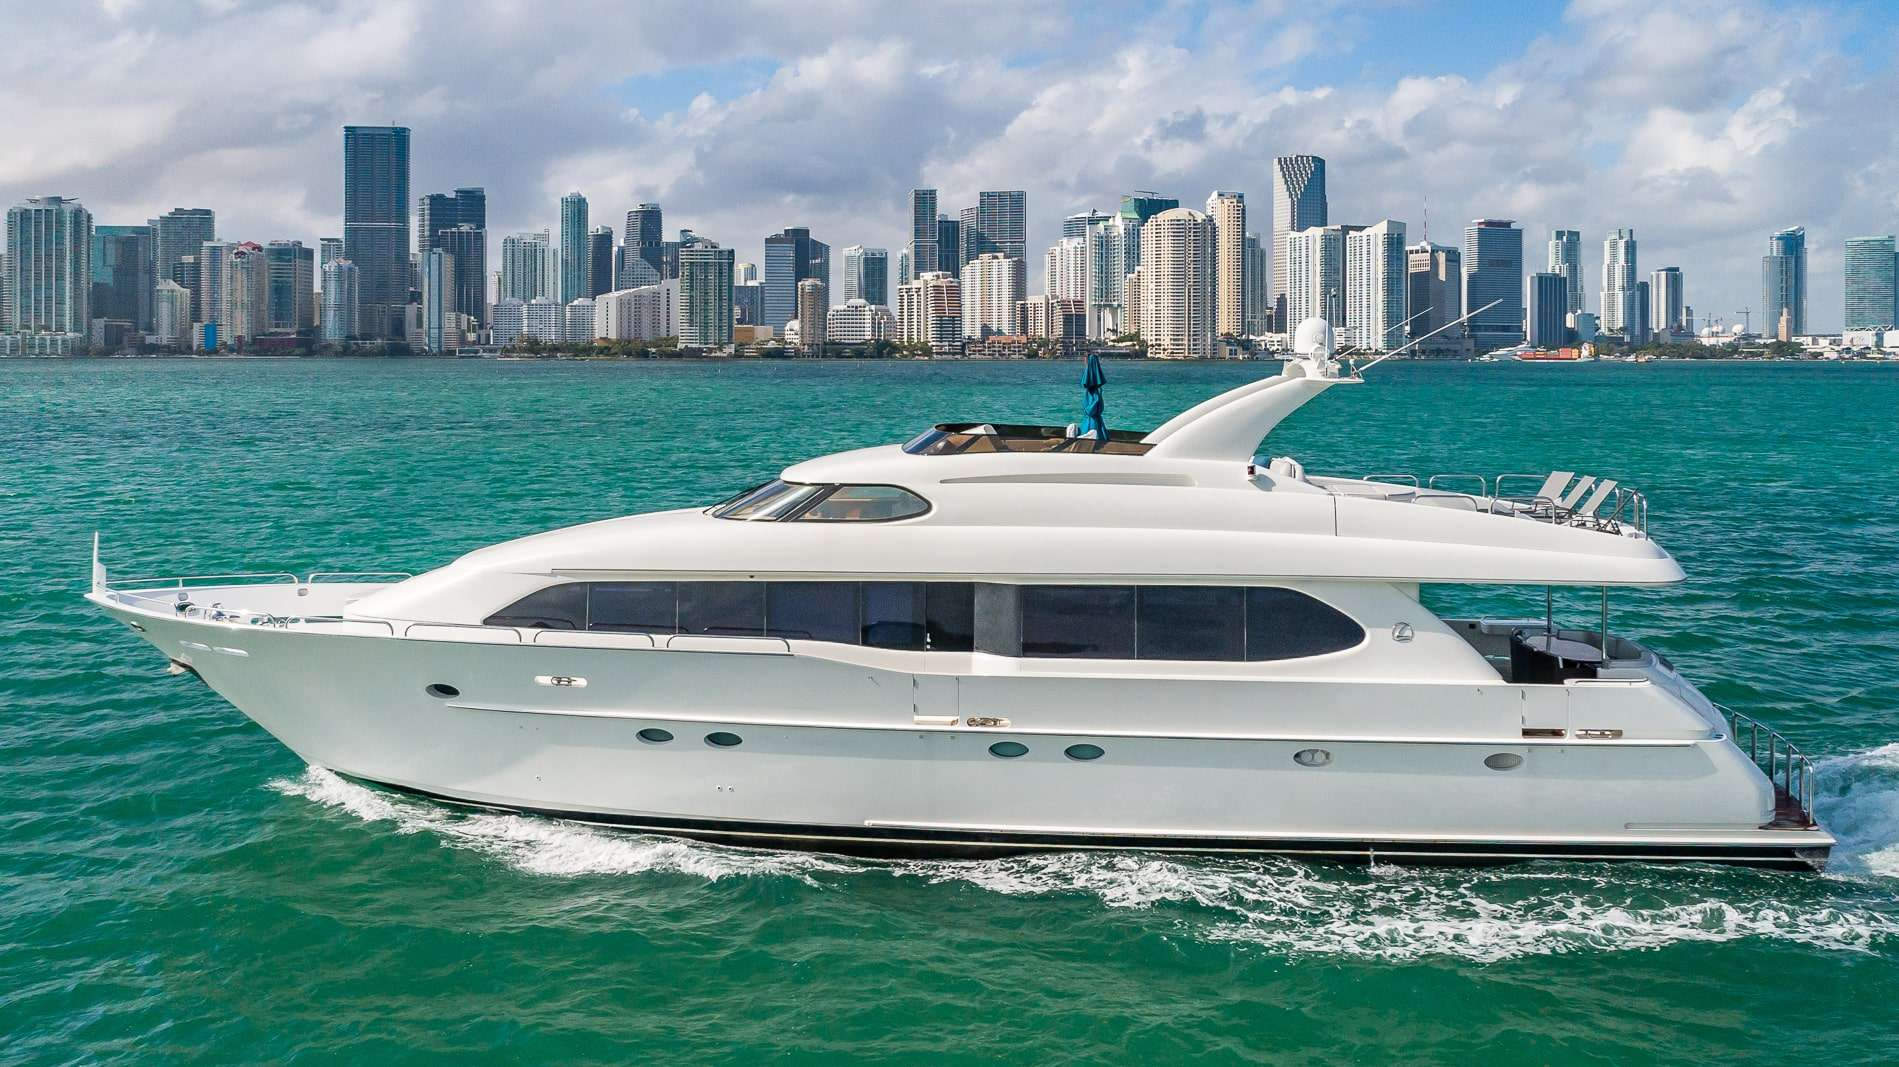 Main image of IV TRANQUILITY yacht